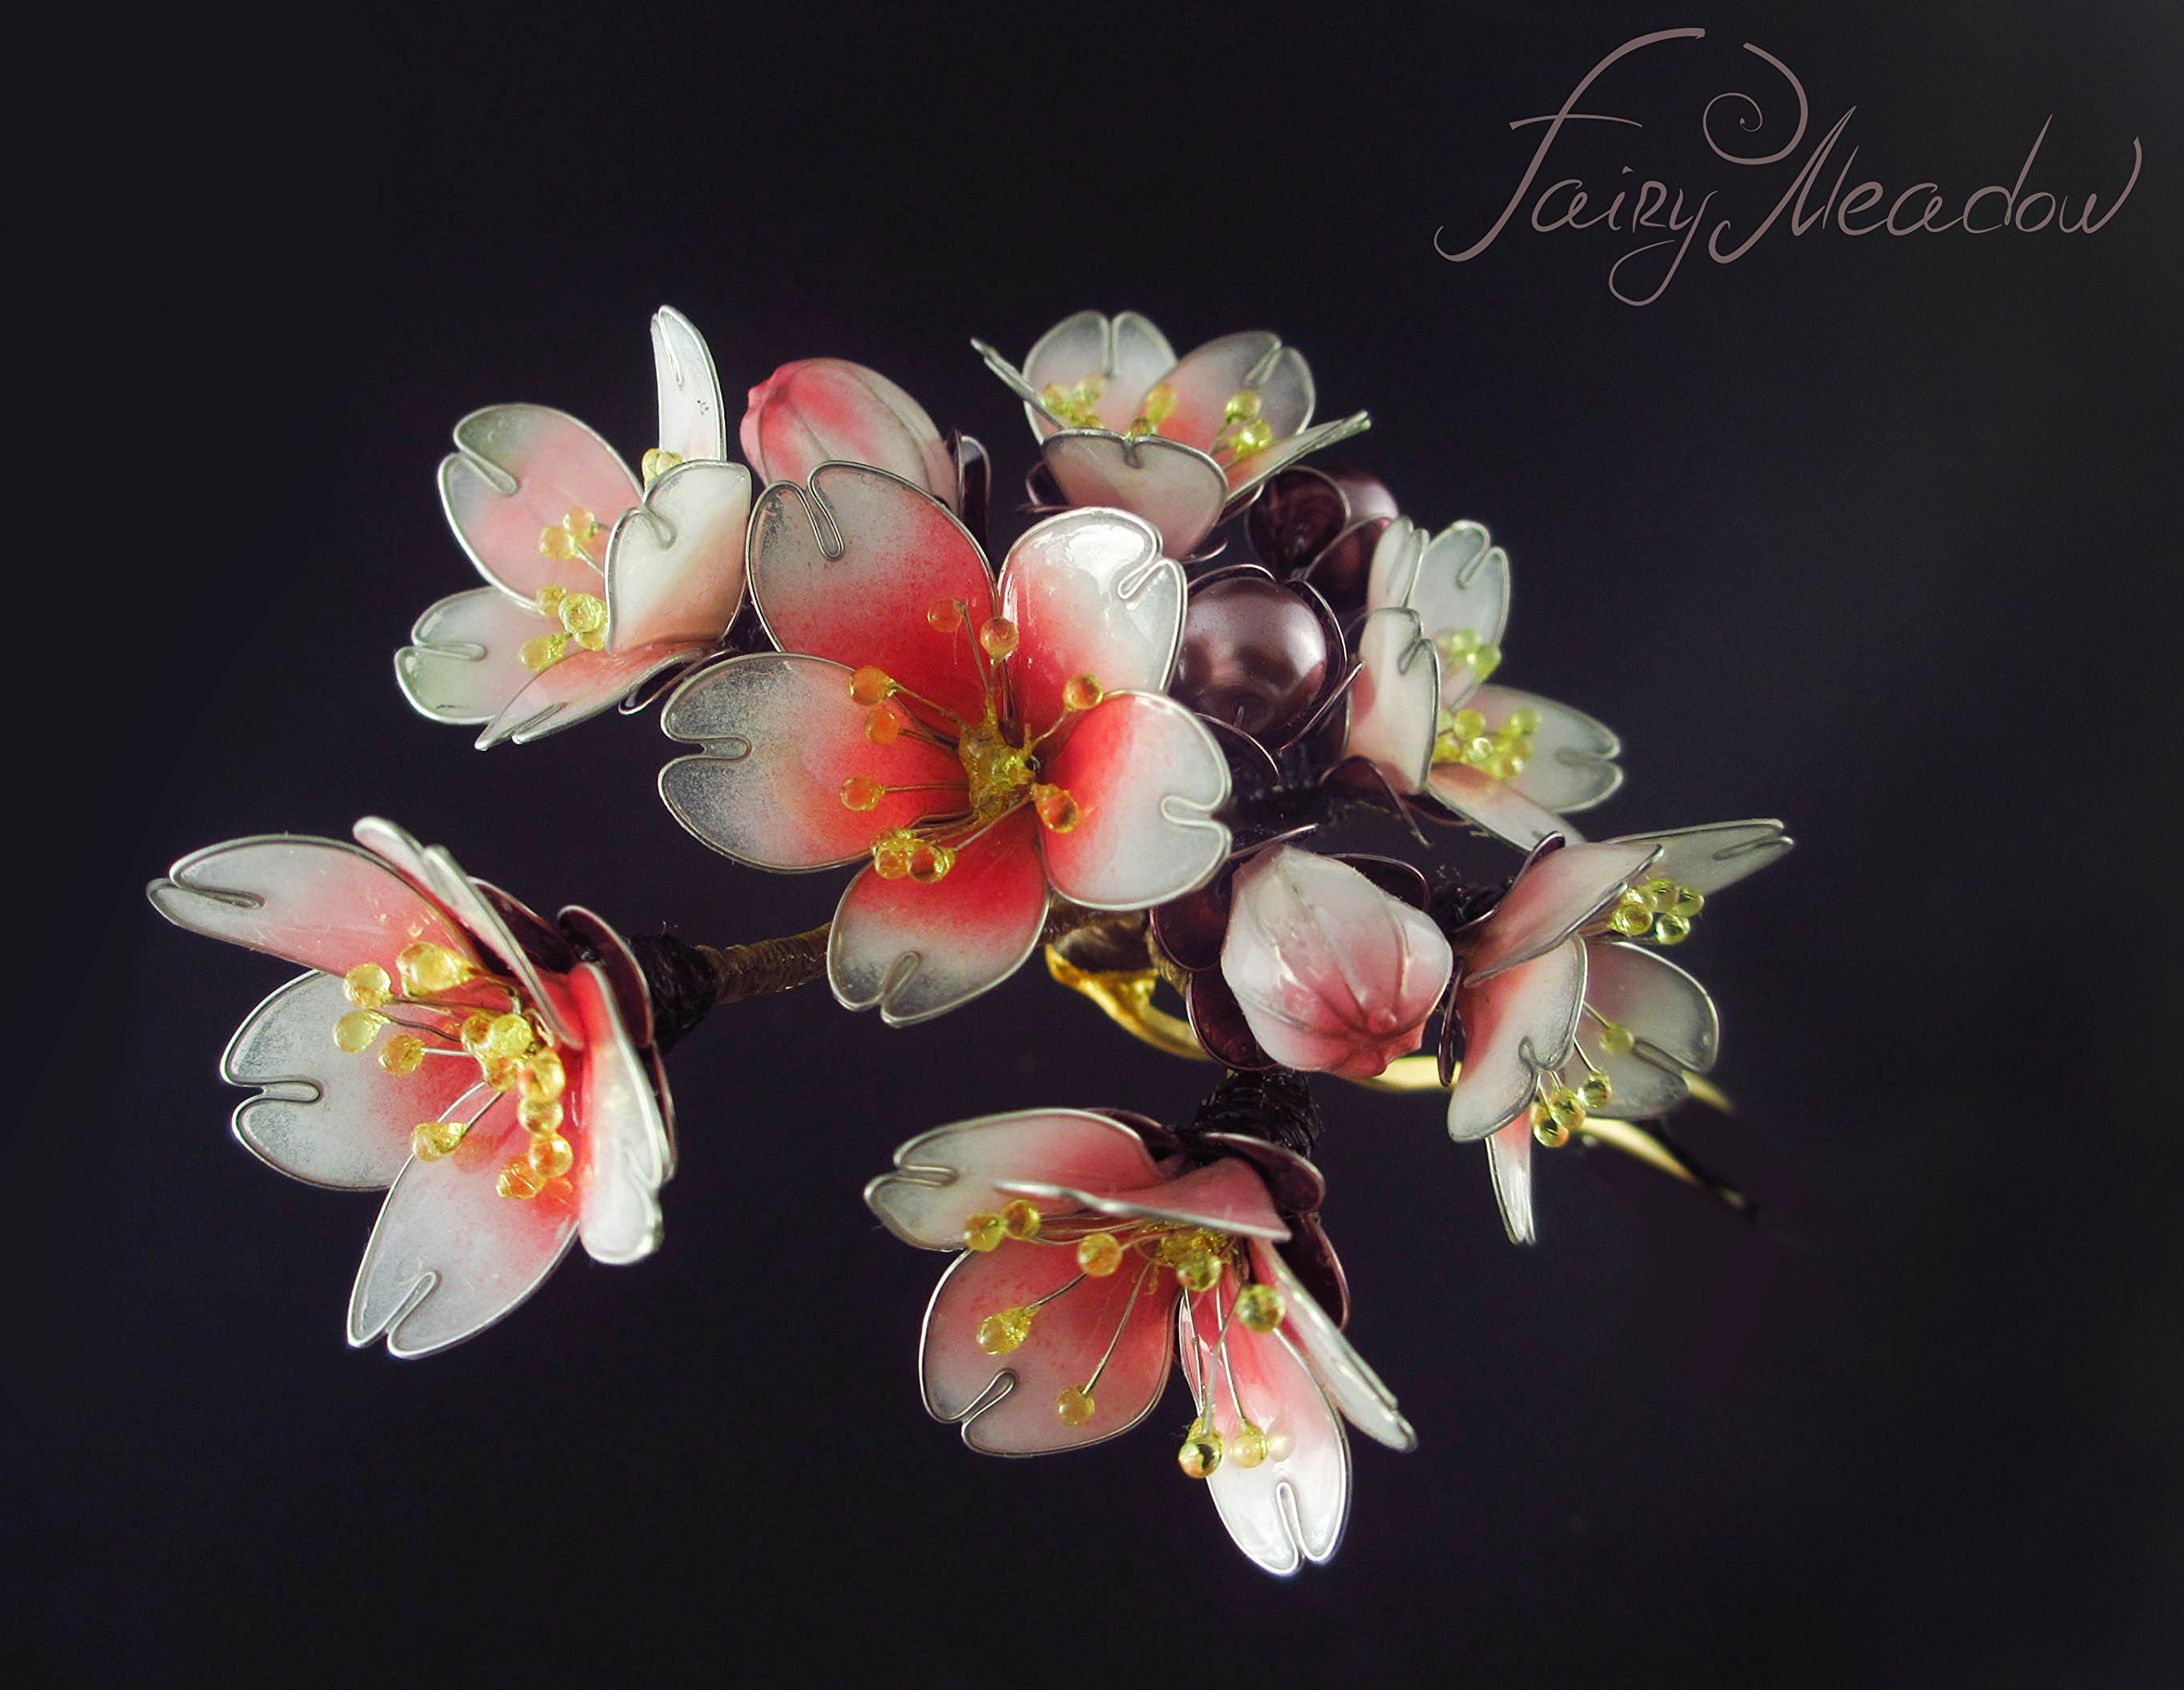 Sakura Blossoms Hairpin Handmade Pink Cherry Bloom Resin Stick Japanese Kanzashi